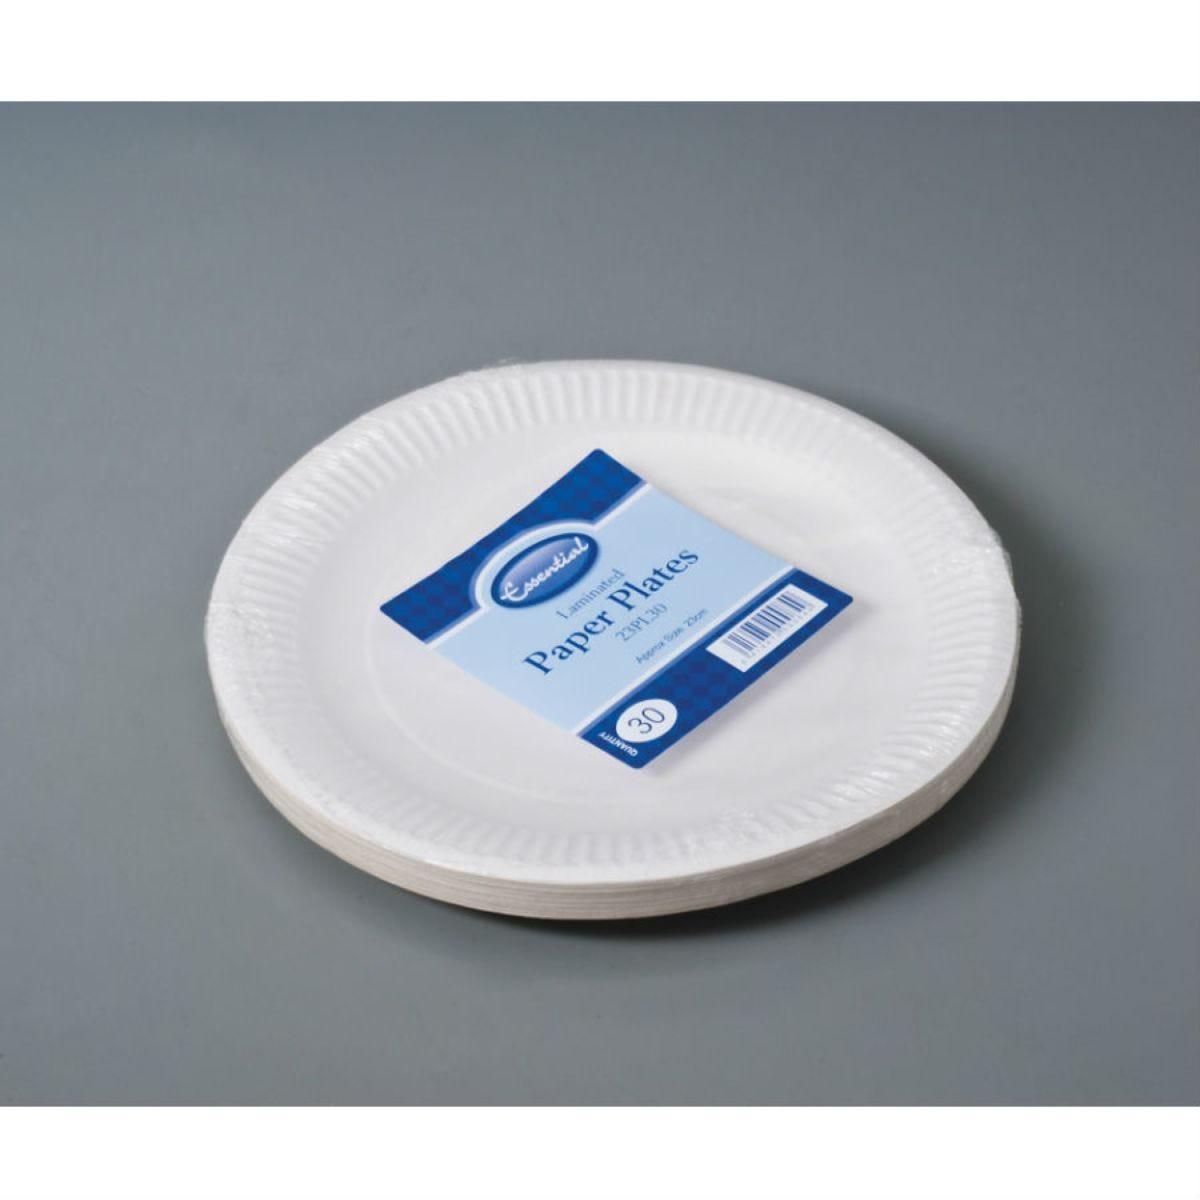 Essential Housewares Biodegradable Paper Plates - 30 Pack